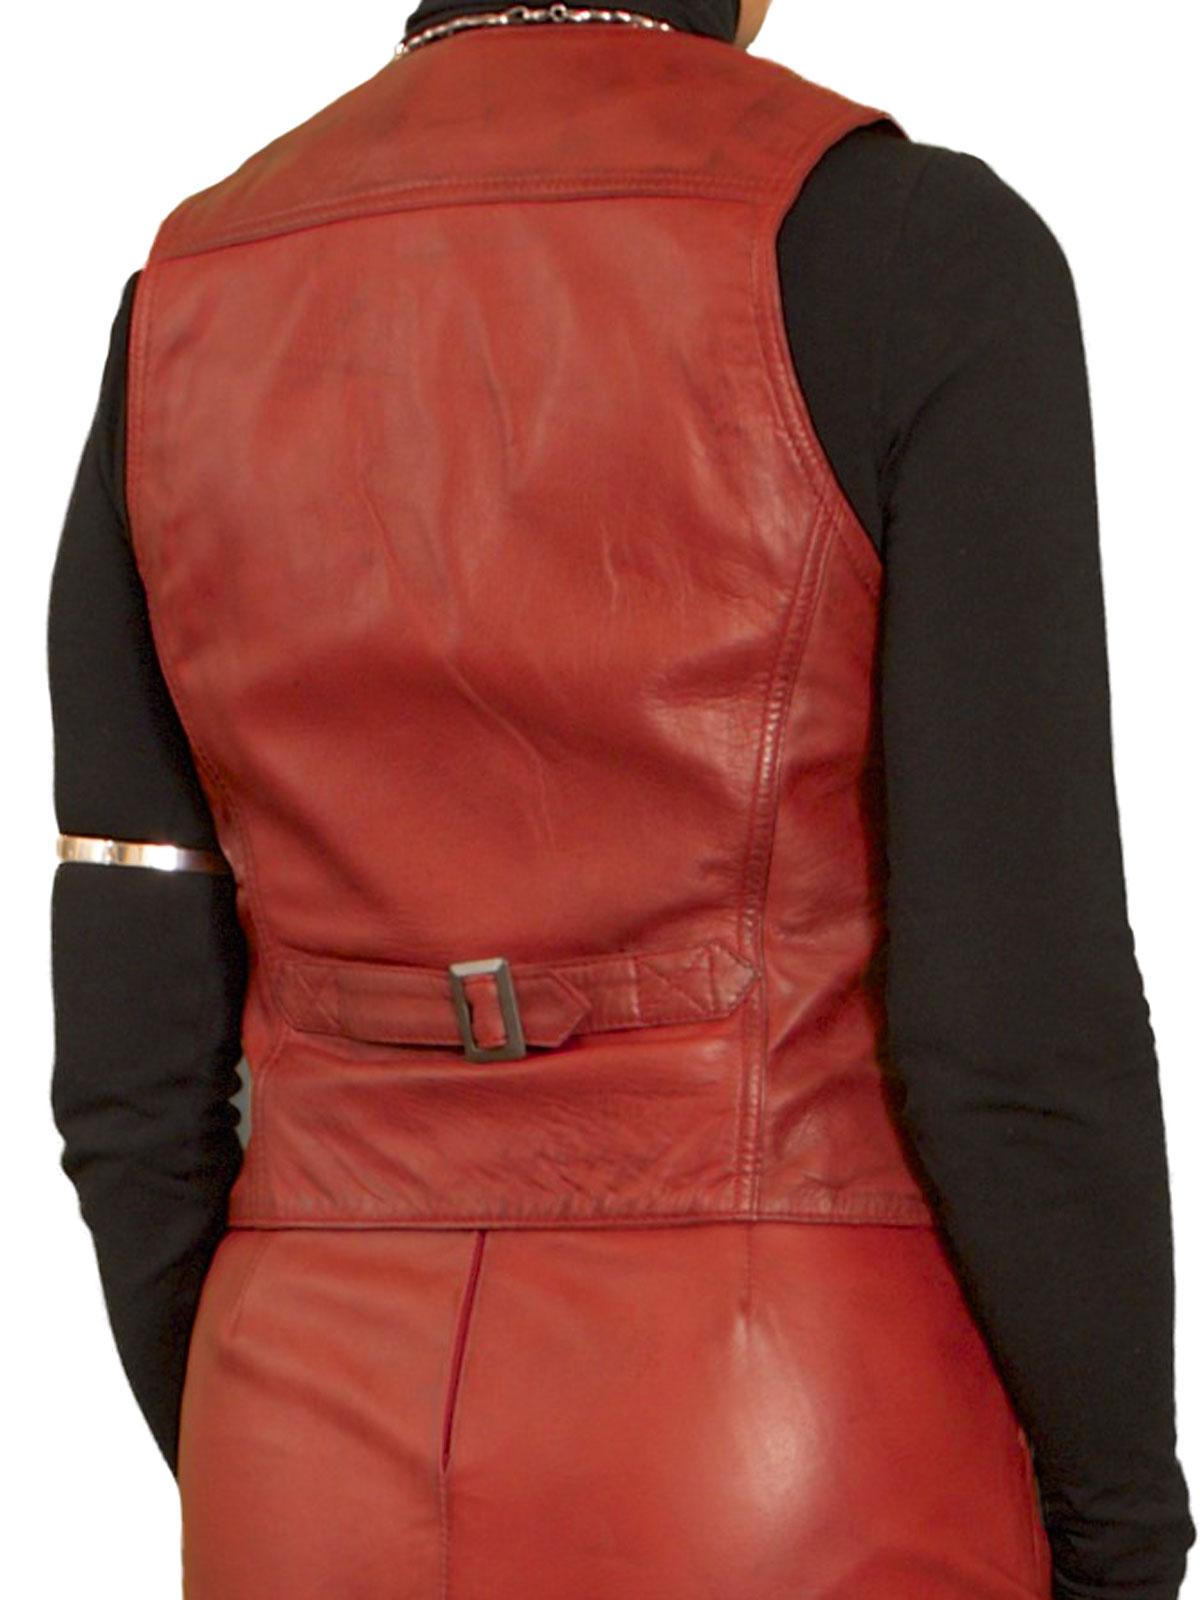 Womens Luxury Leather Waistcoat Back Belt Tout Ensemble